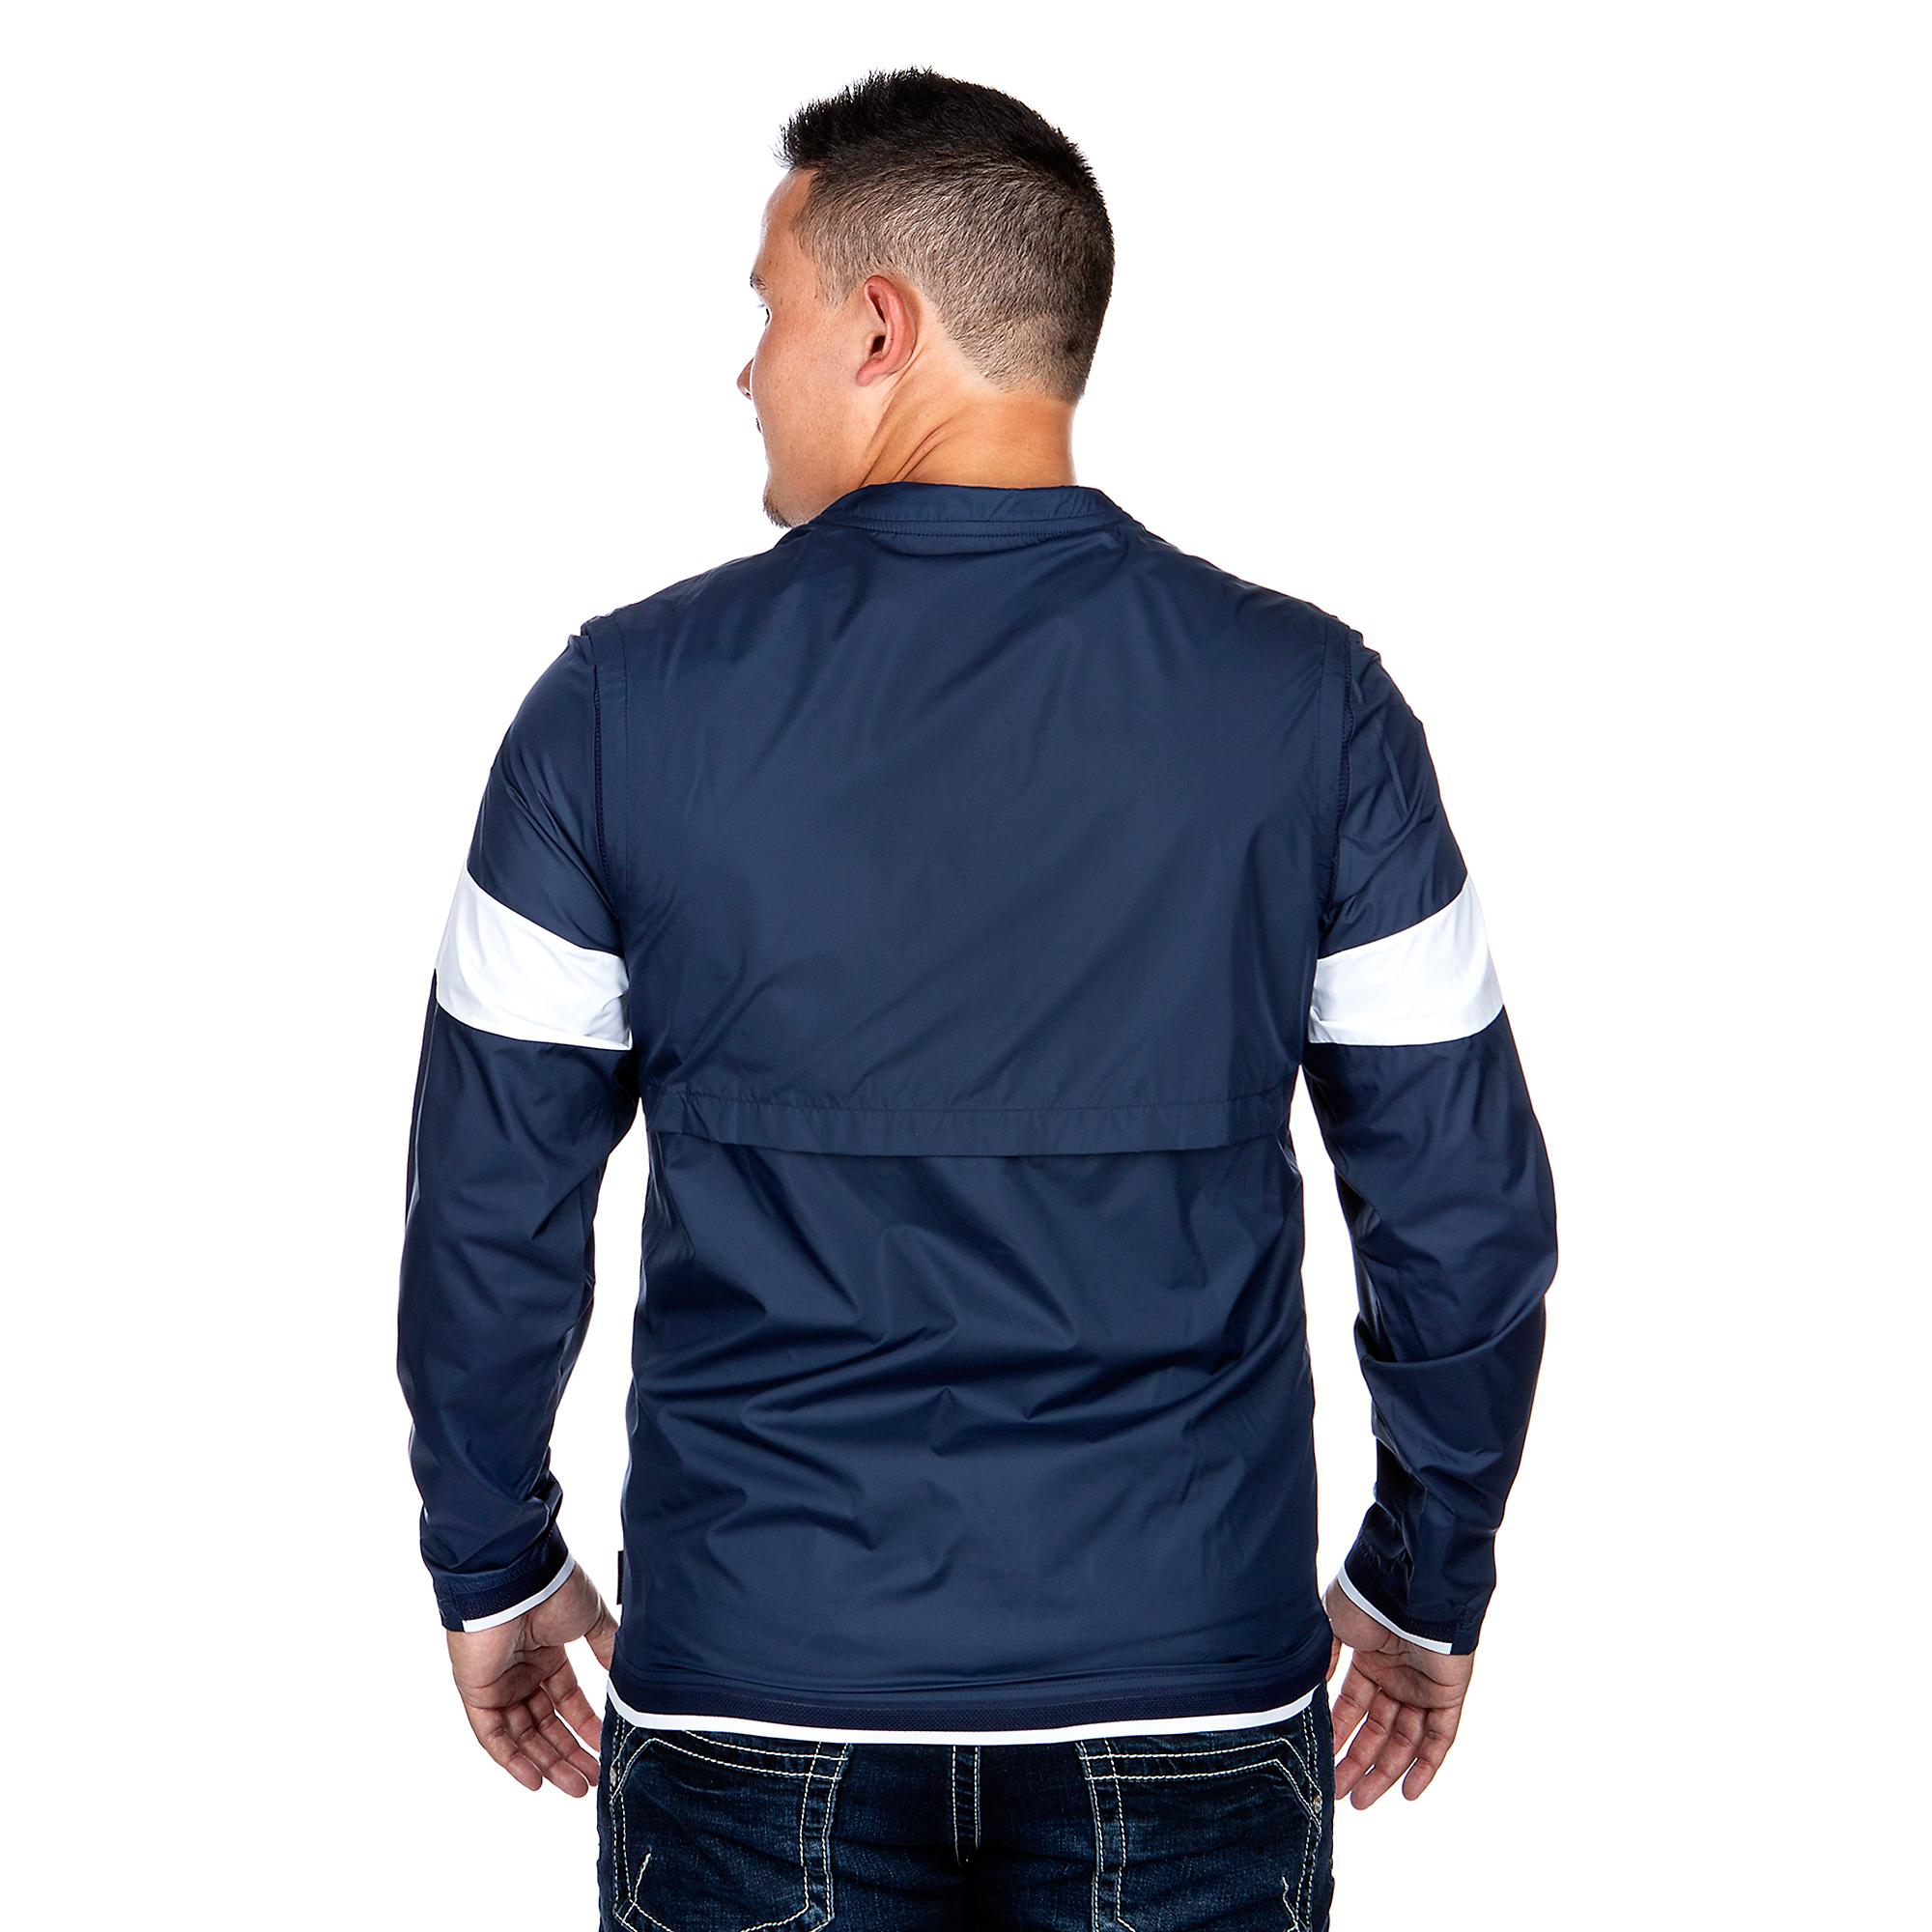 size 40 06818 102c4 Dallas Cowboys Nike Lightweight Coach Jacket | Fans United